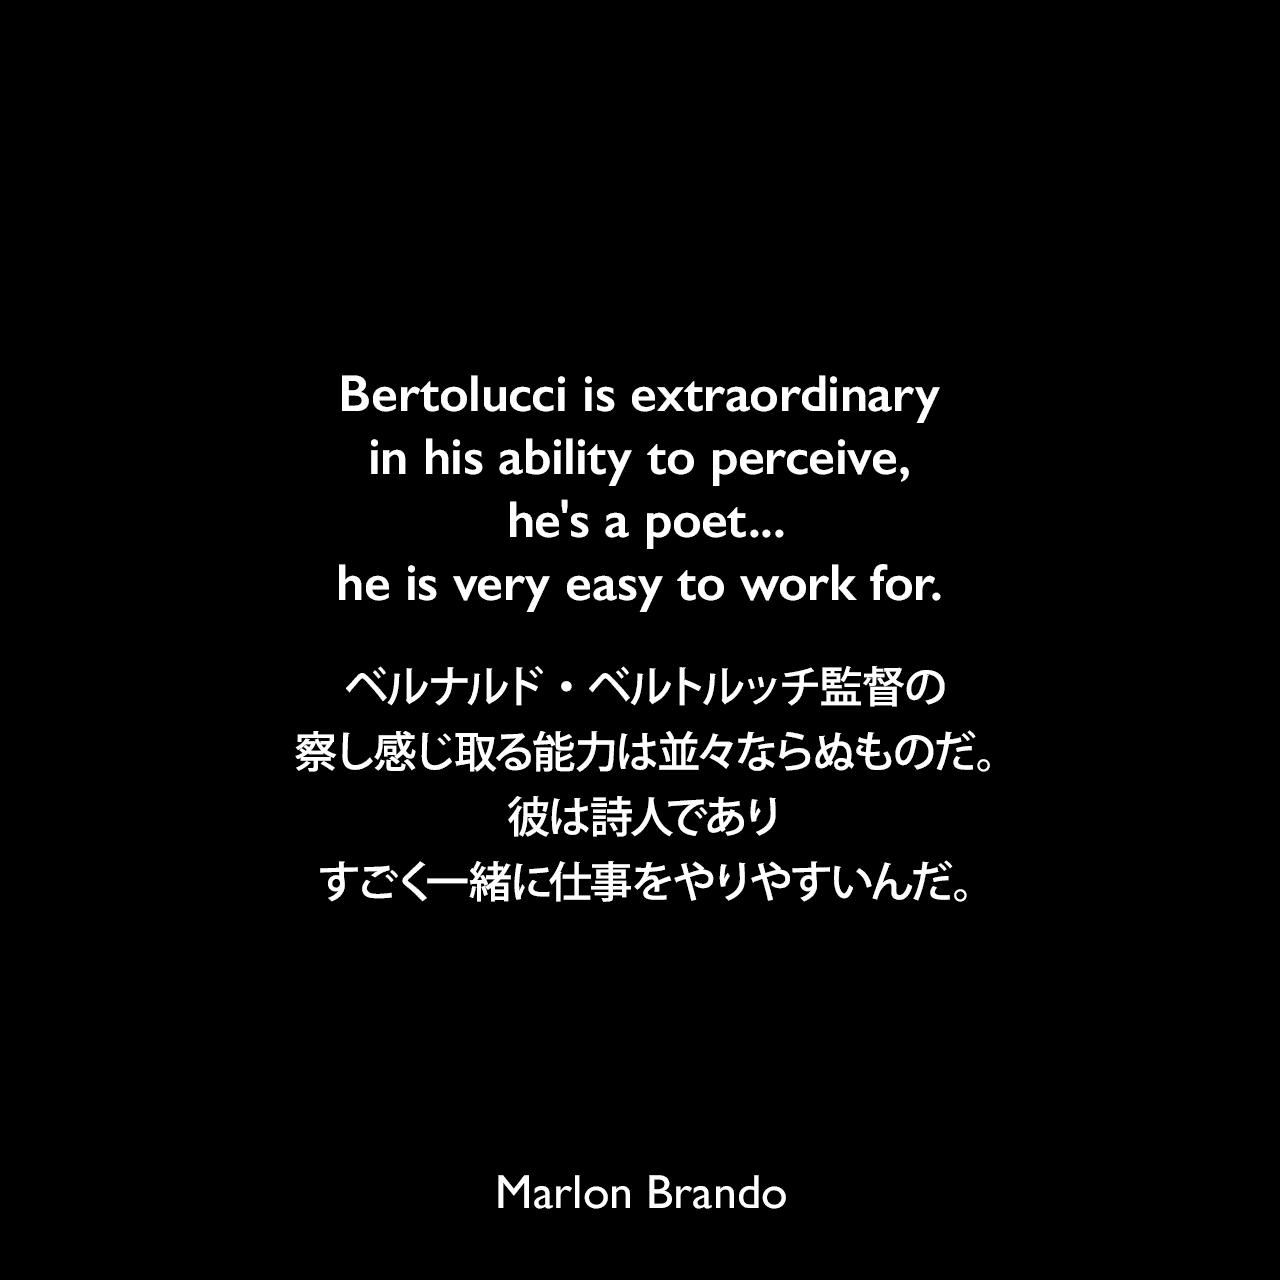 Bertolucci is extraordinary in his ability to perceive, he's a poet...he is very easy to work for.ベルナルド・ベルトルッチ監督の、察し感じ取る能力は並々ならぬものだ。彼は詩人であり、すごく一緒に仕事をやりやすいんだ。- Rolling Stone誌 No. 213 (1976年) よりMarlon Brando